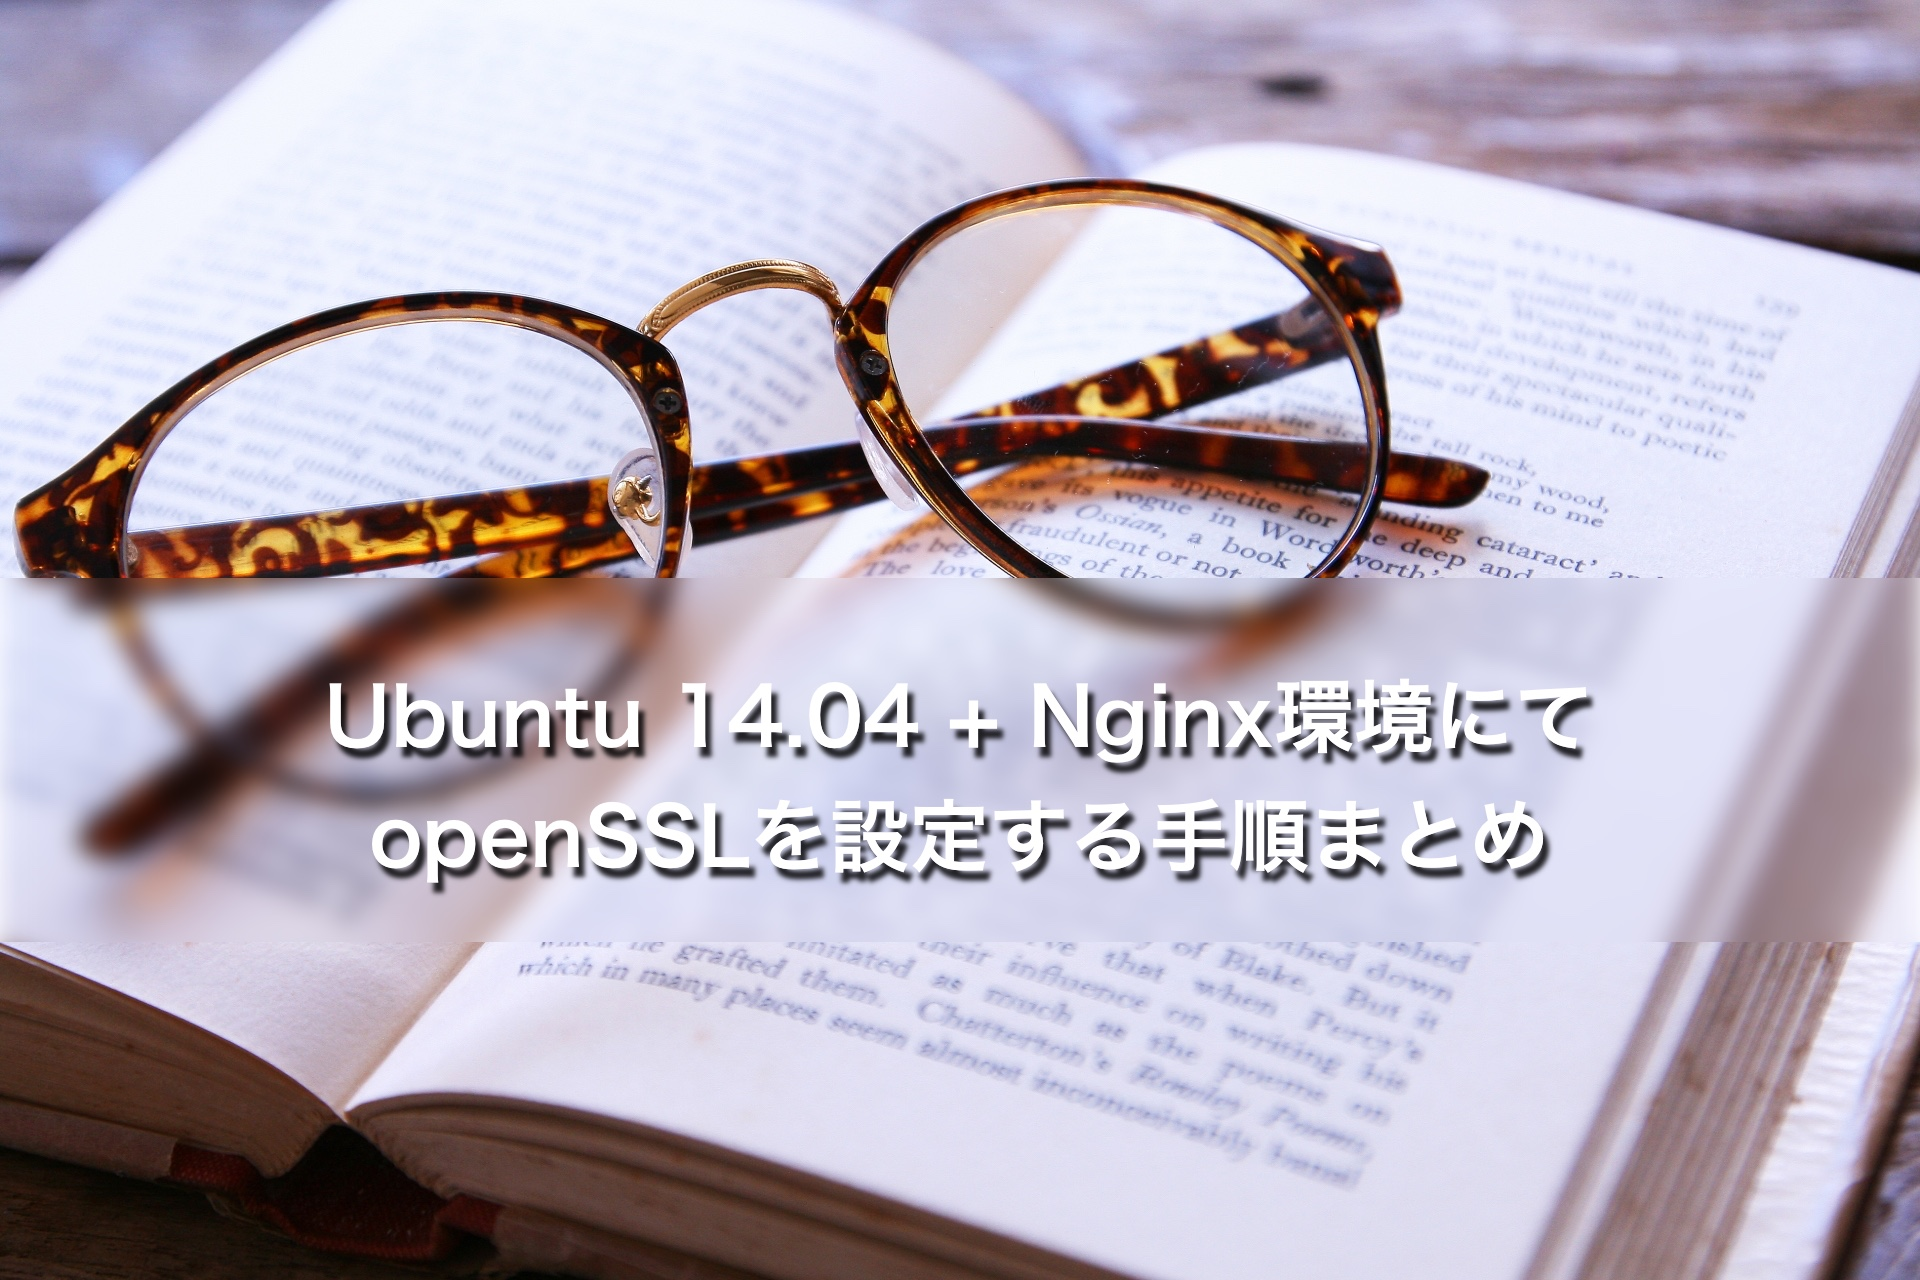 Ubuntu 14.04 + Nginx環境にてopenSSLを設定する手順まとめ